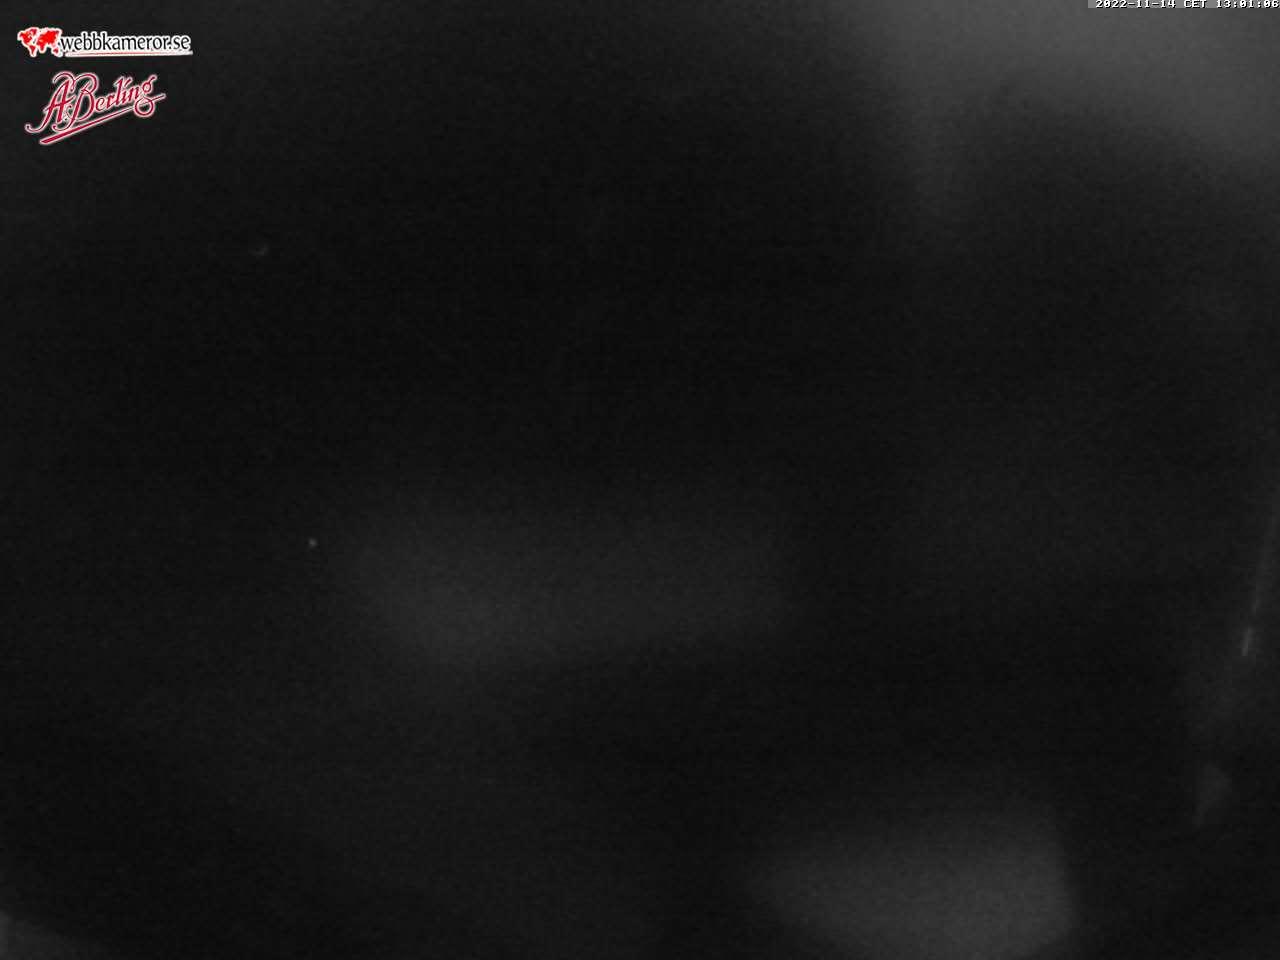 Webbkamera i Halmstad - Ergosafe o Berlings Boule & Padelbana